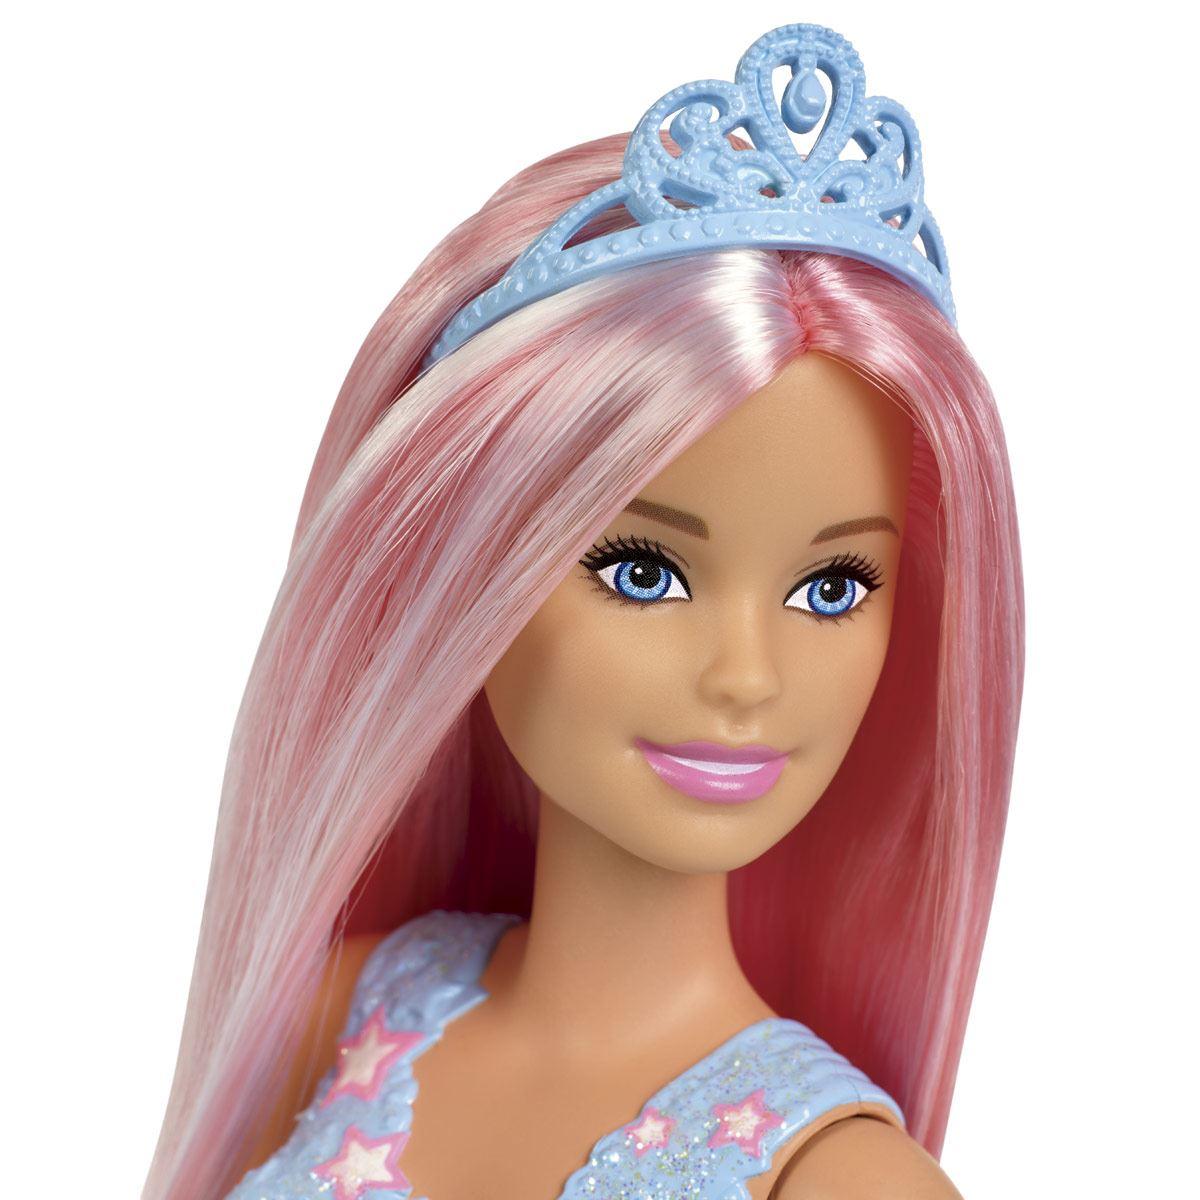 Barbie Princesa Peinados Mágicos